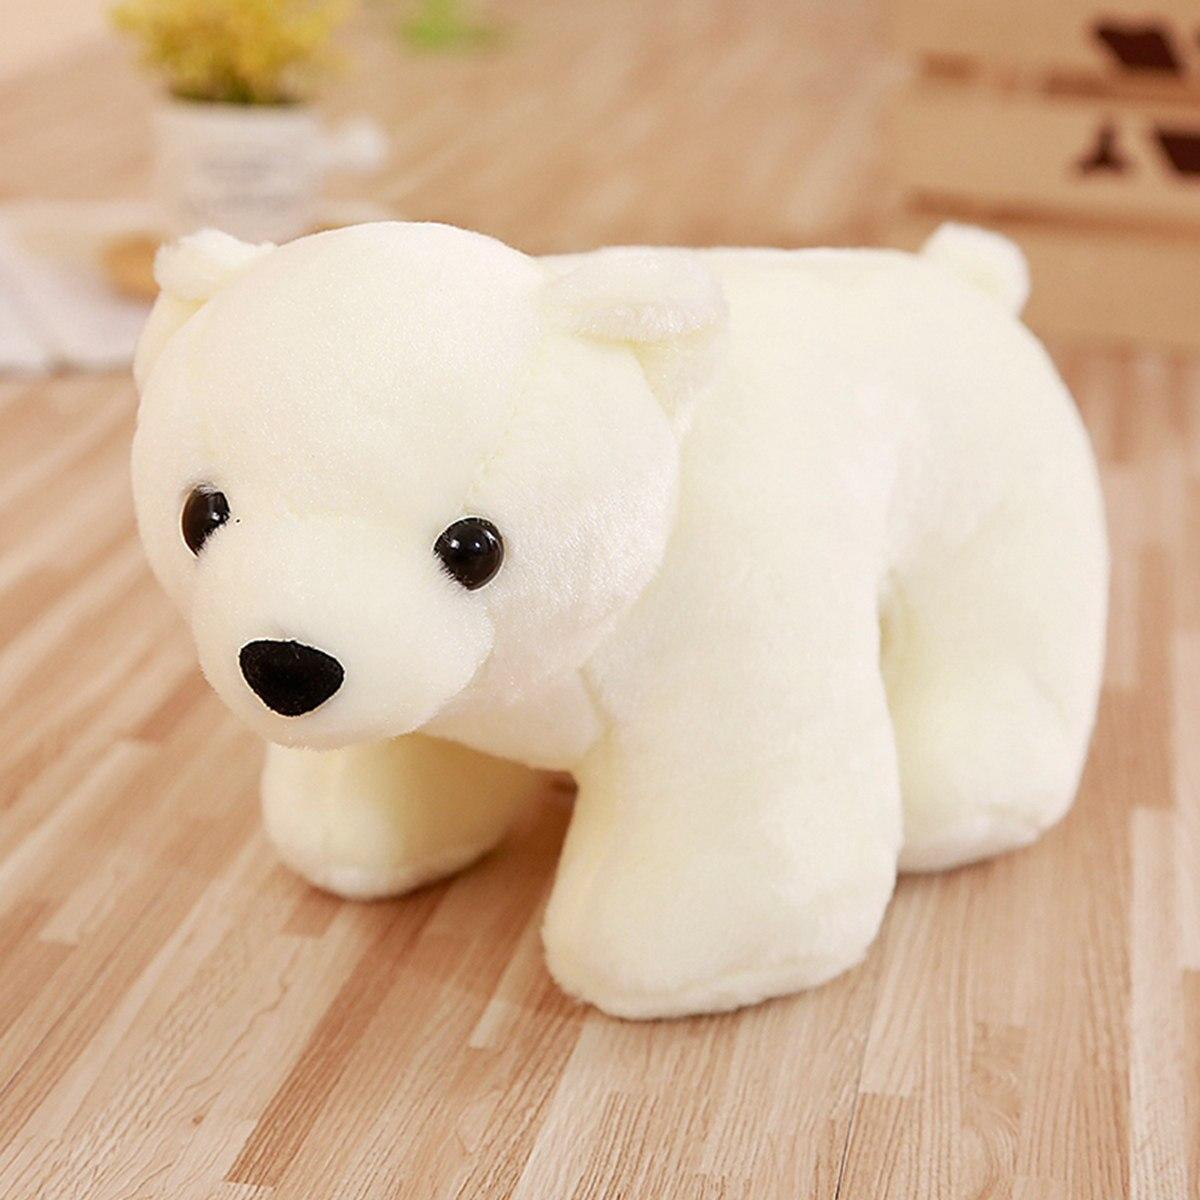 Jumbo Animal Plush Seal Stuffed Soft Giant Big Doll Pillow Toy Kid Chair Chest